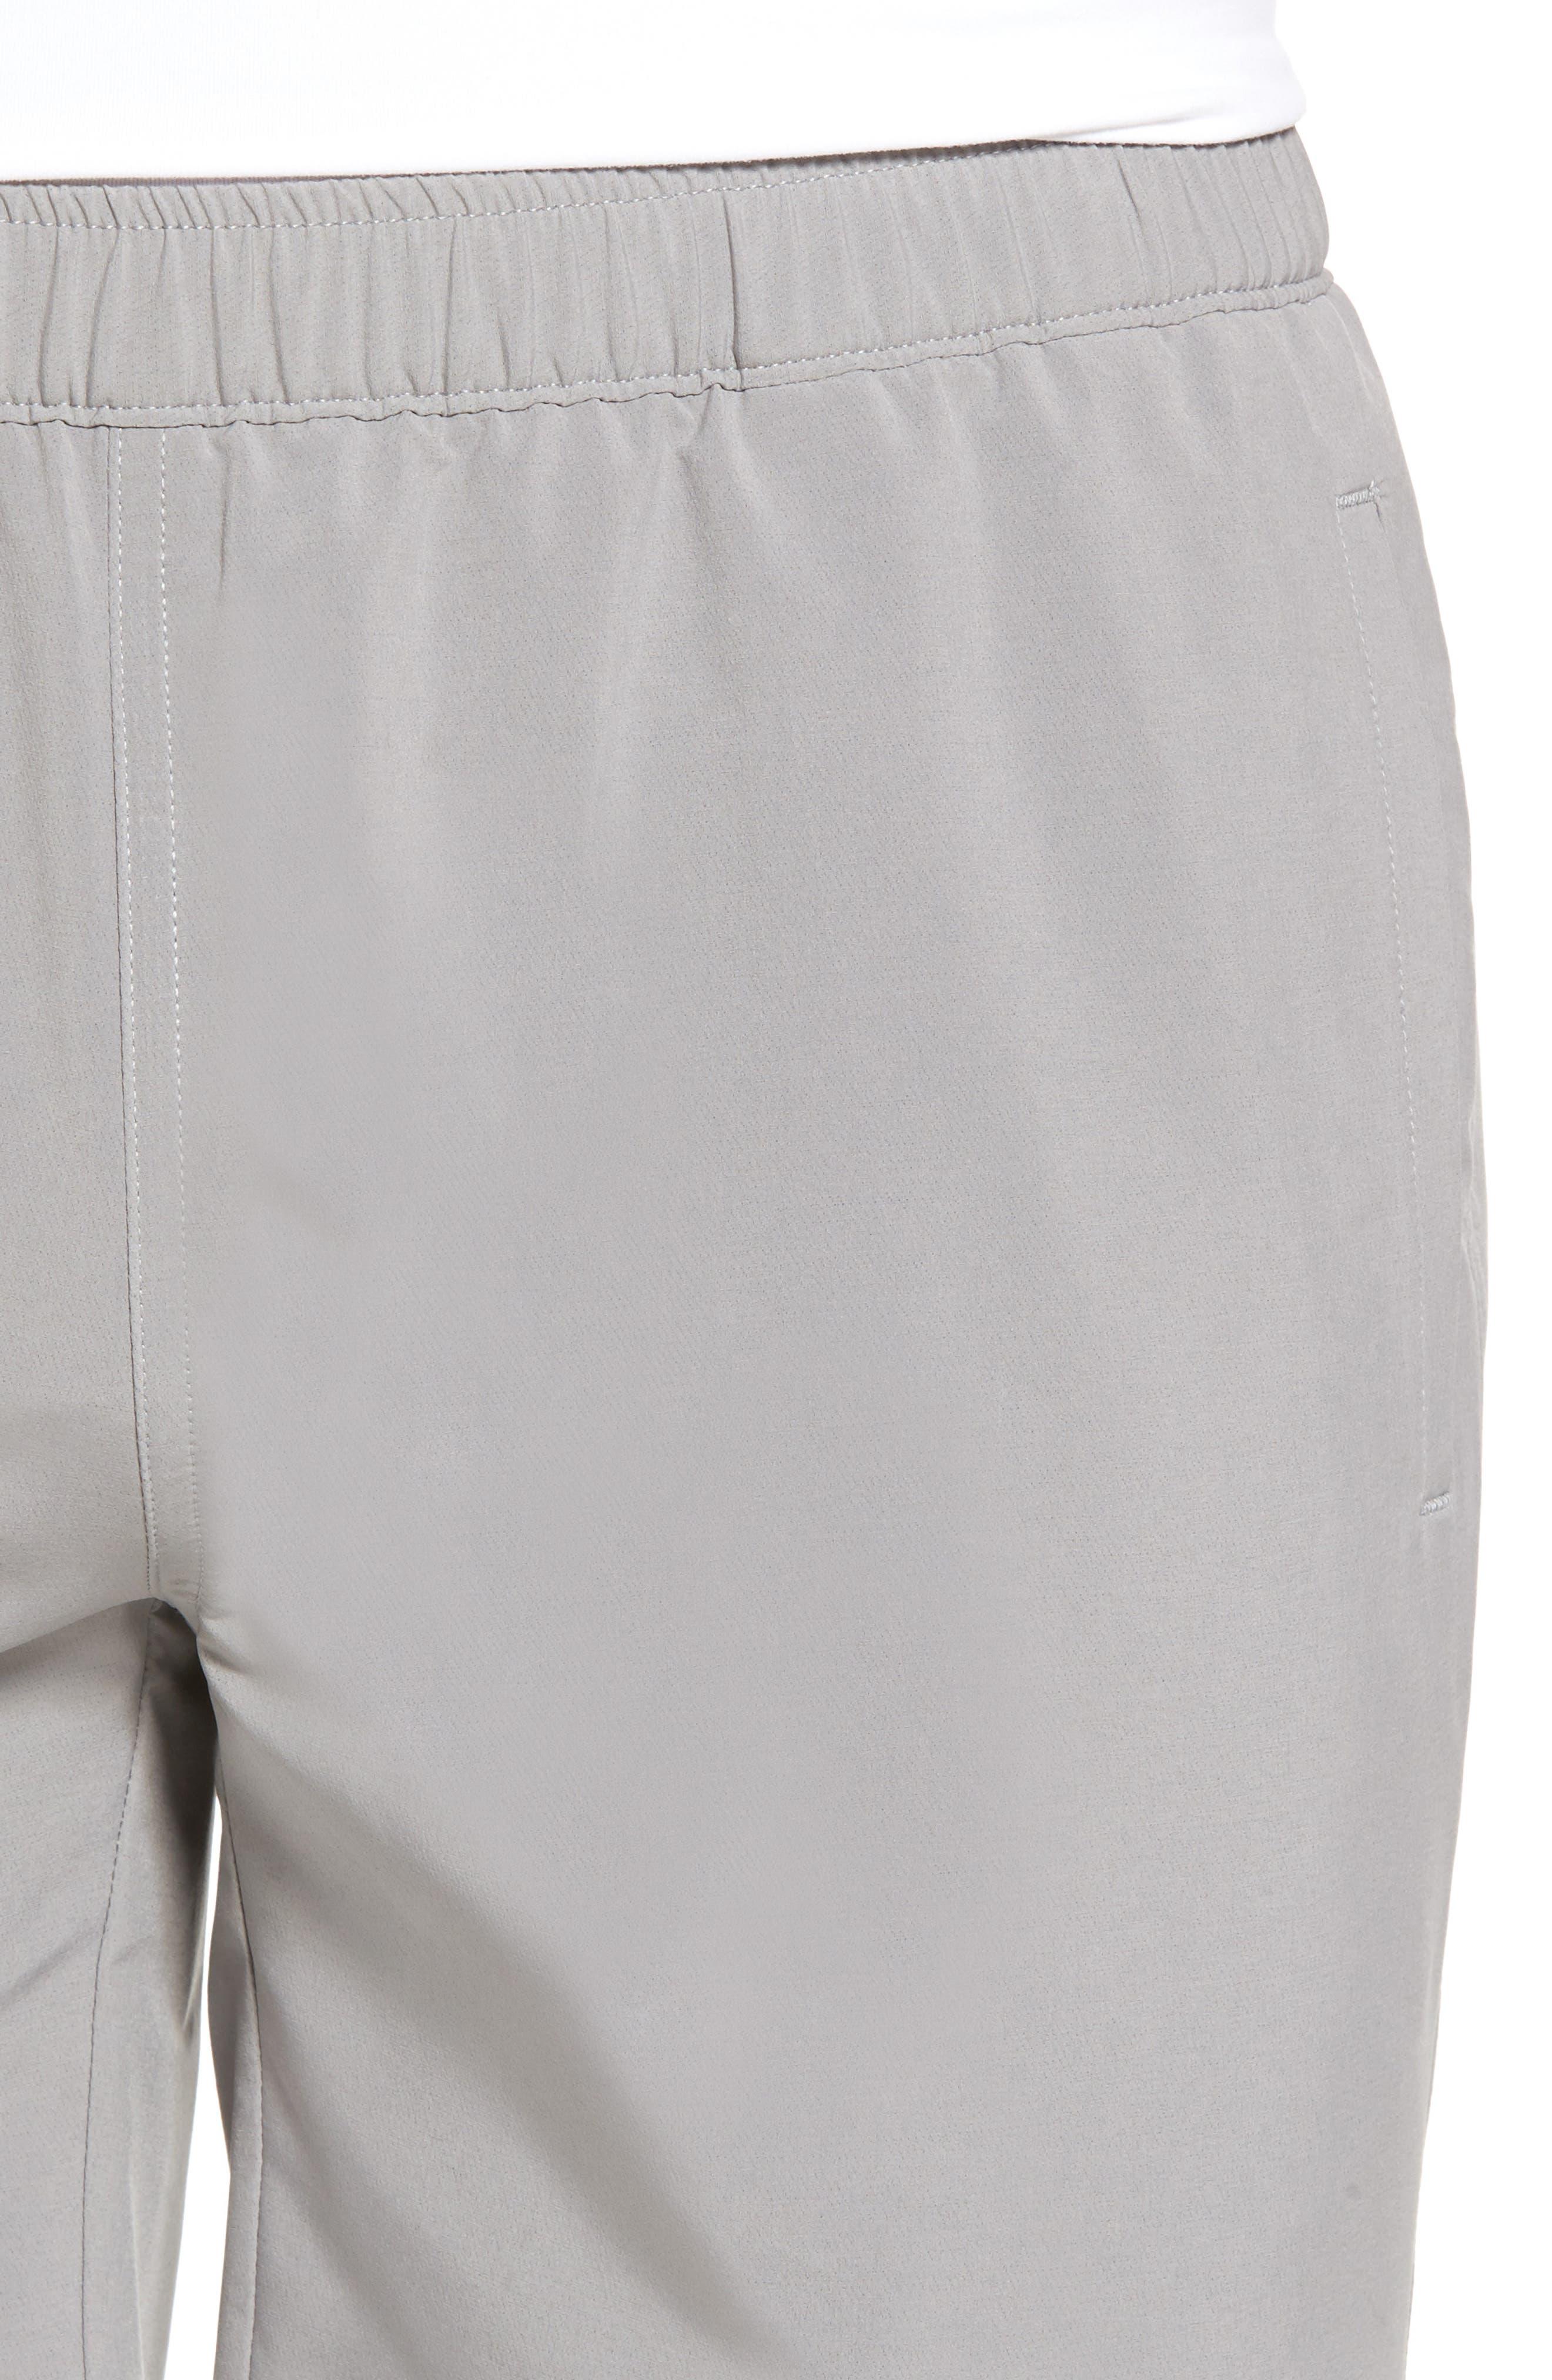 Alternate Image 4  - Peter Millar Oslo Sport Shorts